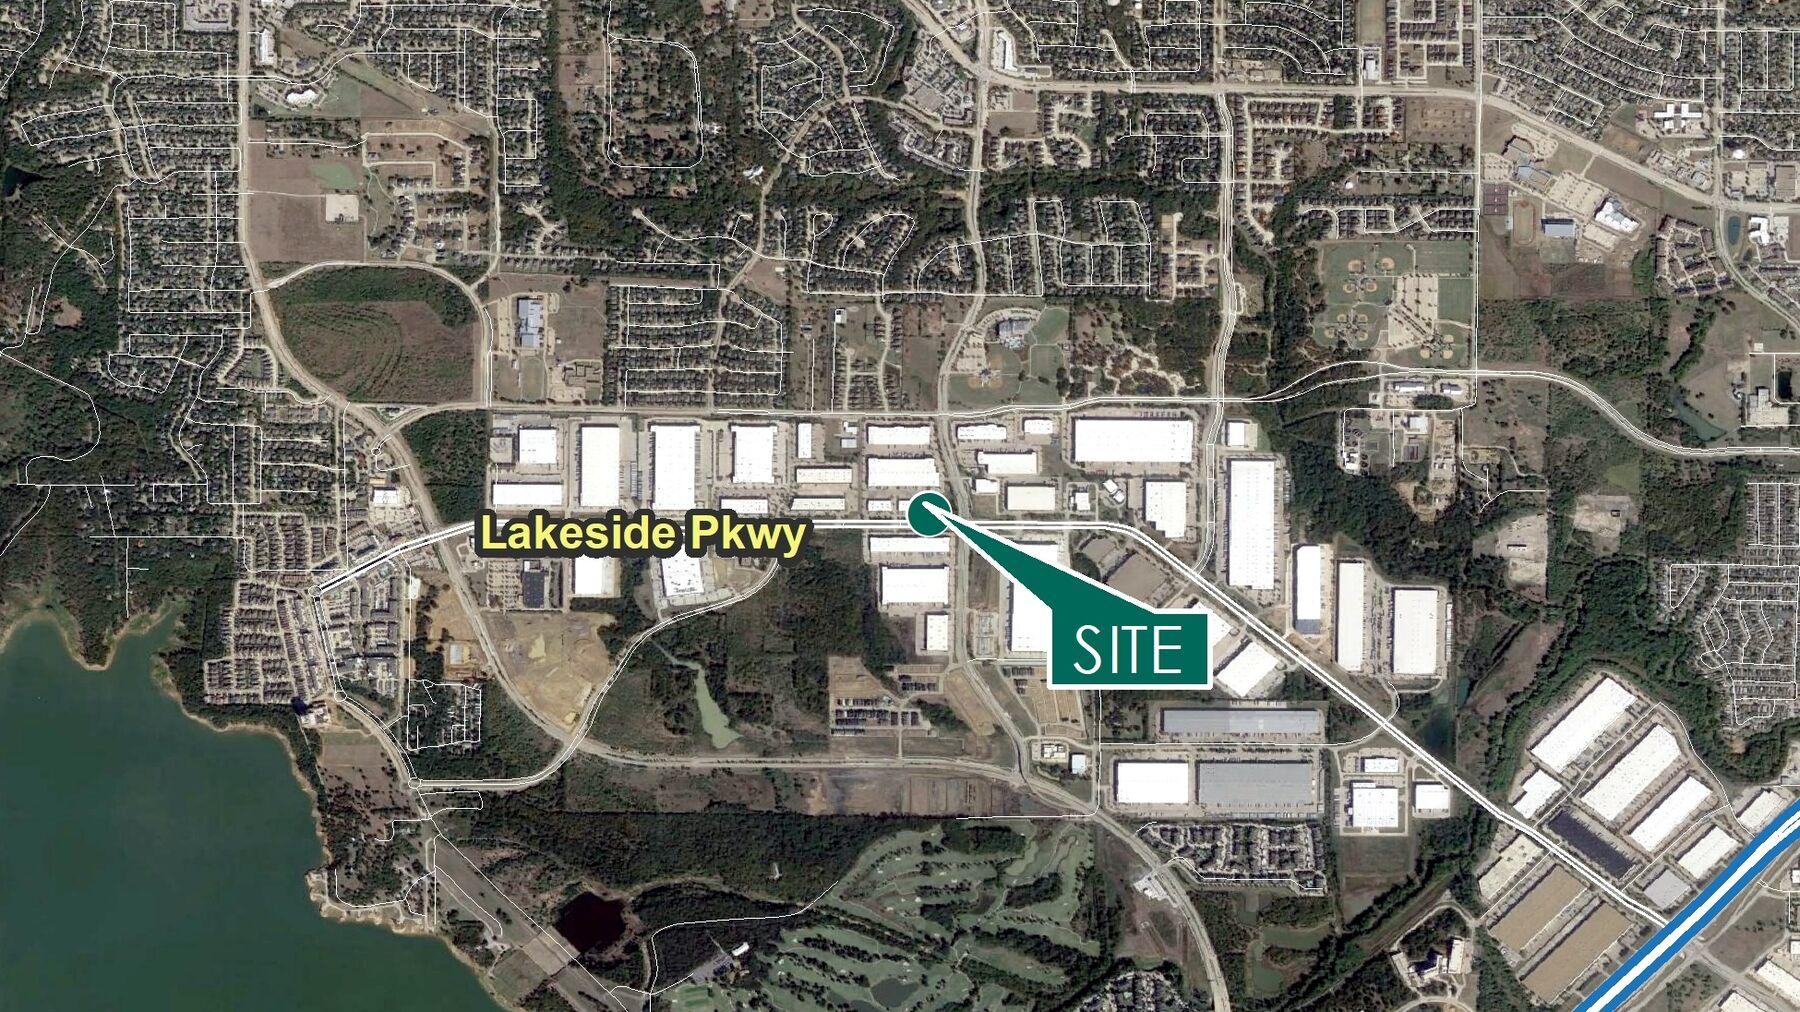 DPM-Prologis-Flower-Mound-2-DAL01402-1200-Lakeside-Parkway_AerialMap.jpg